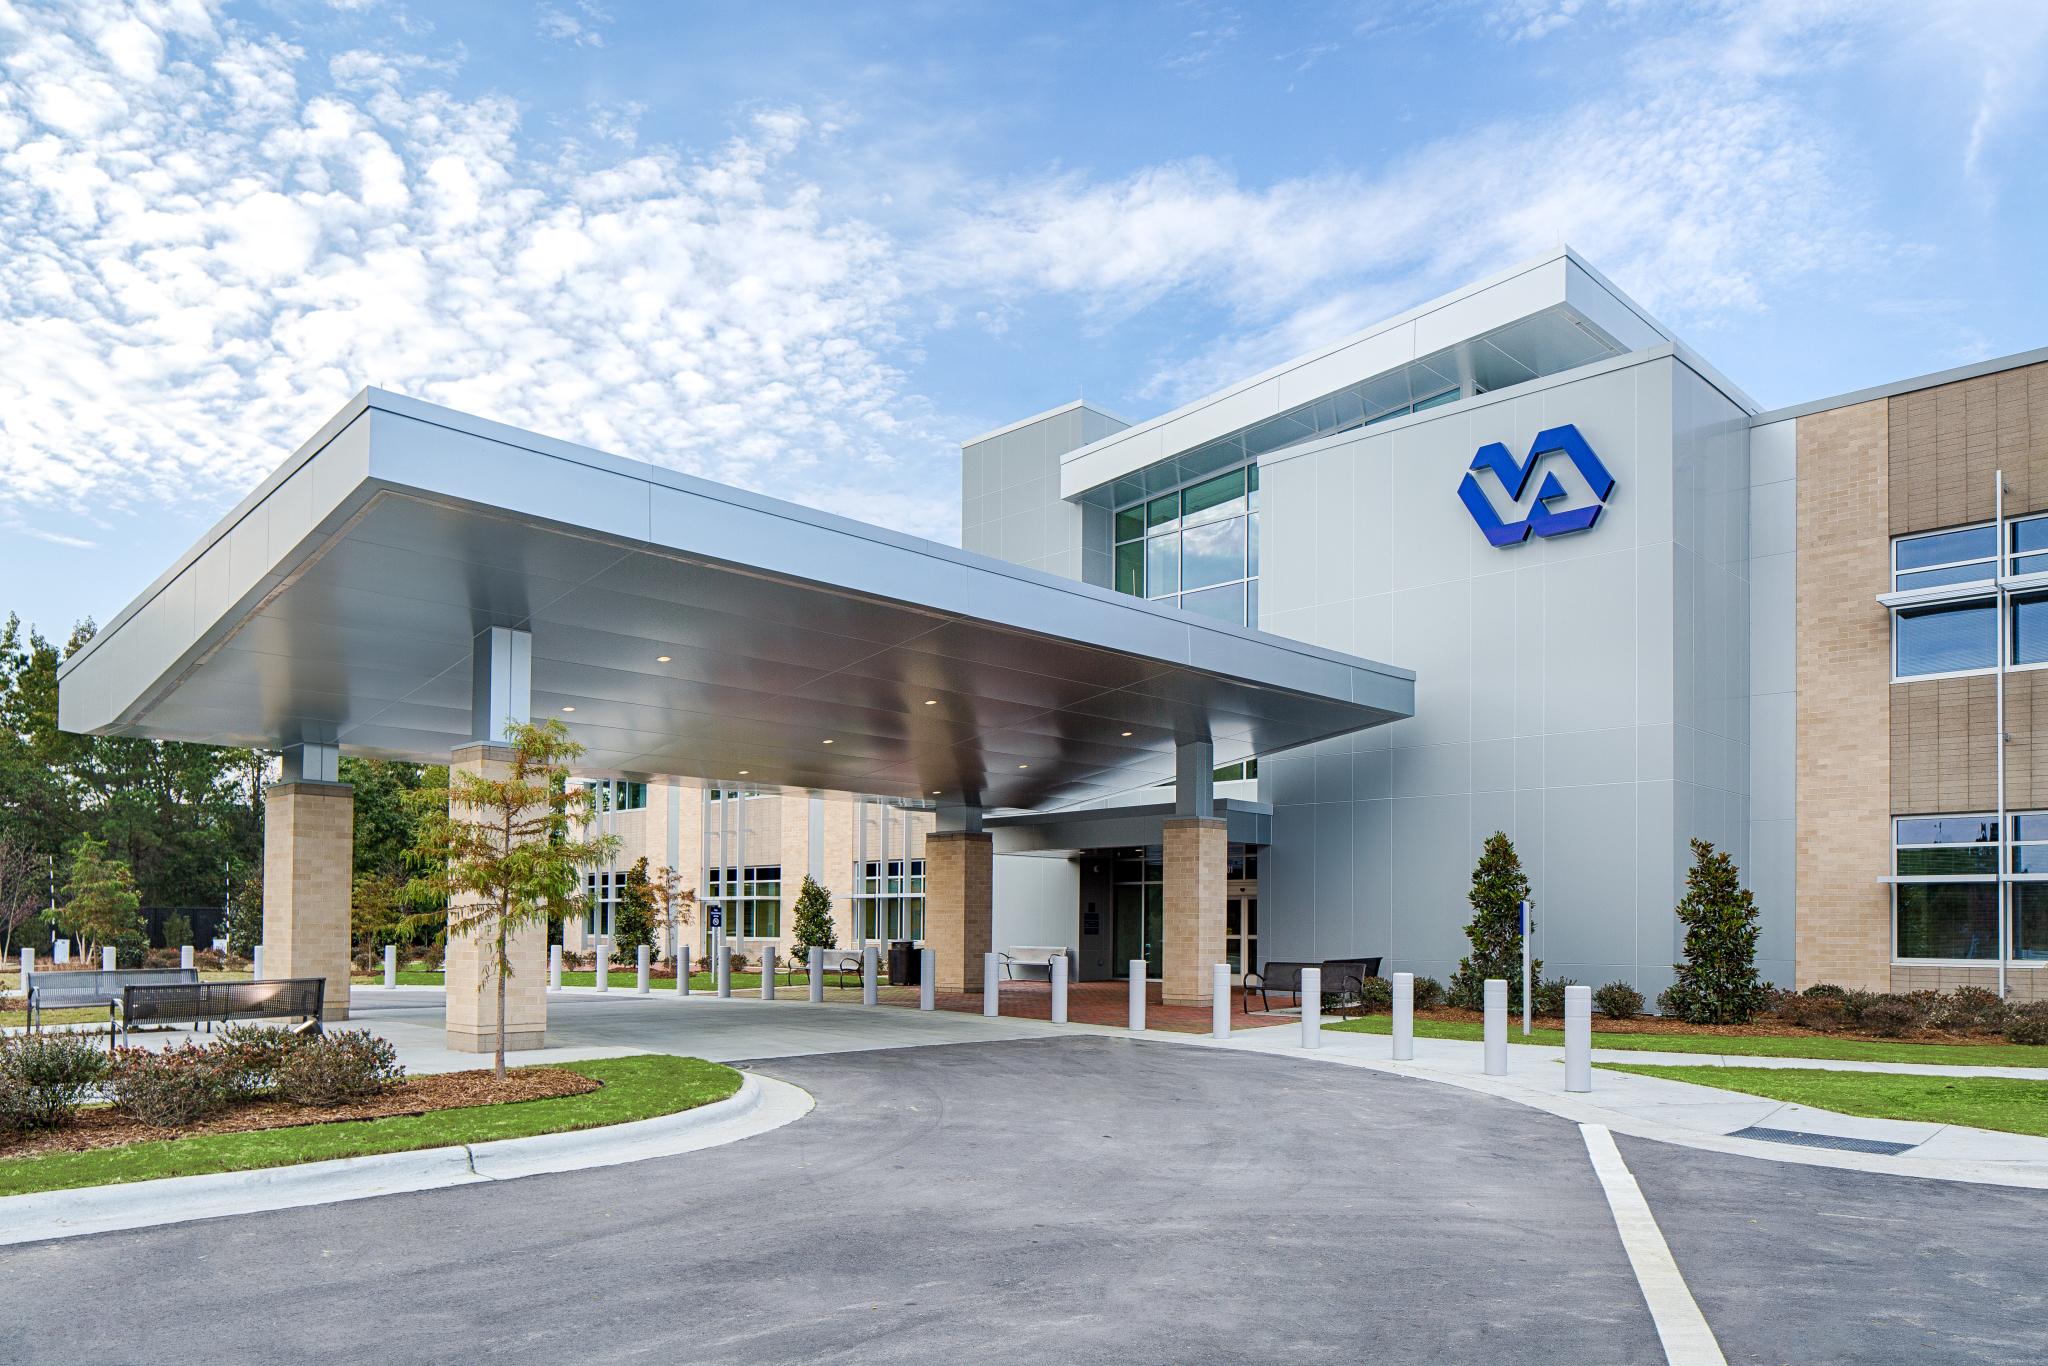 Veterans Affairs Greenville Outpatient Center Architect